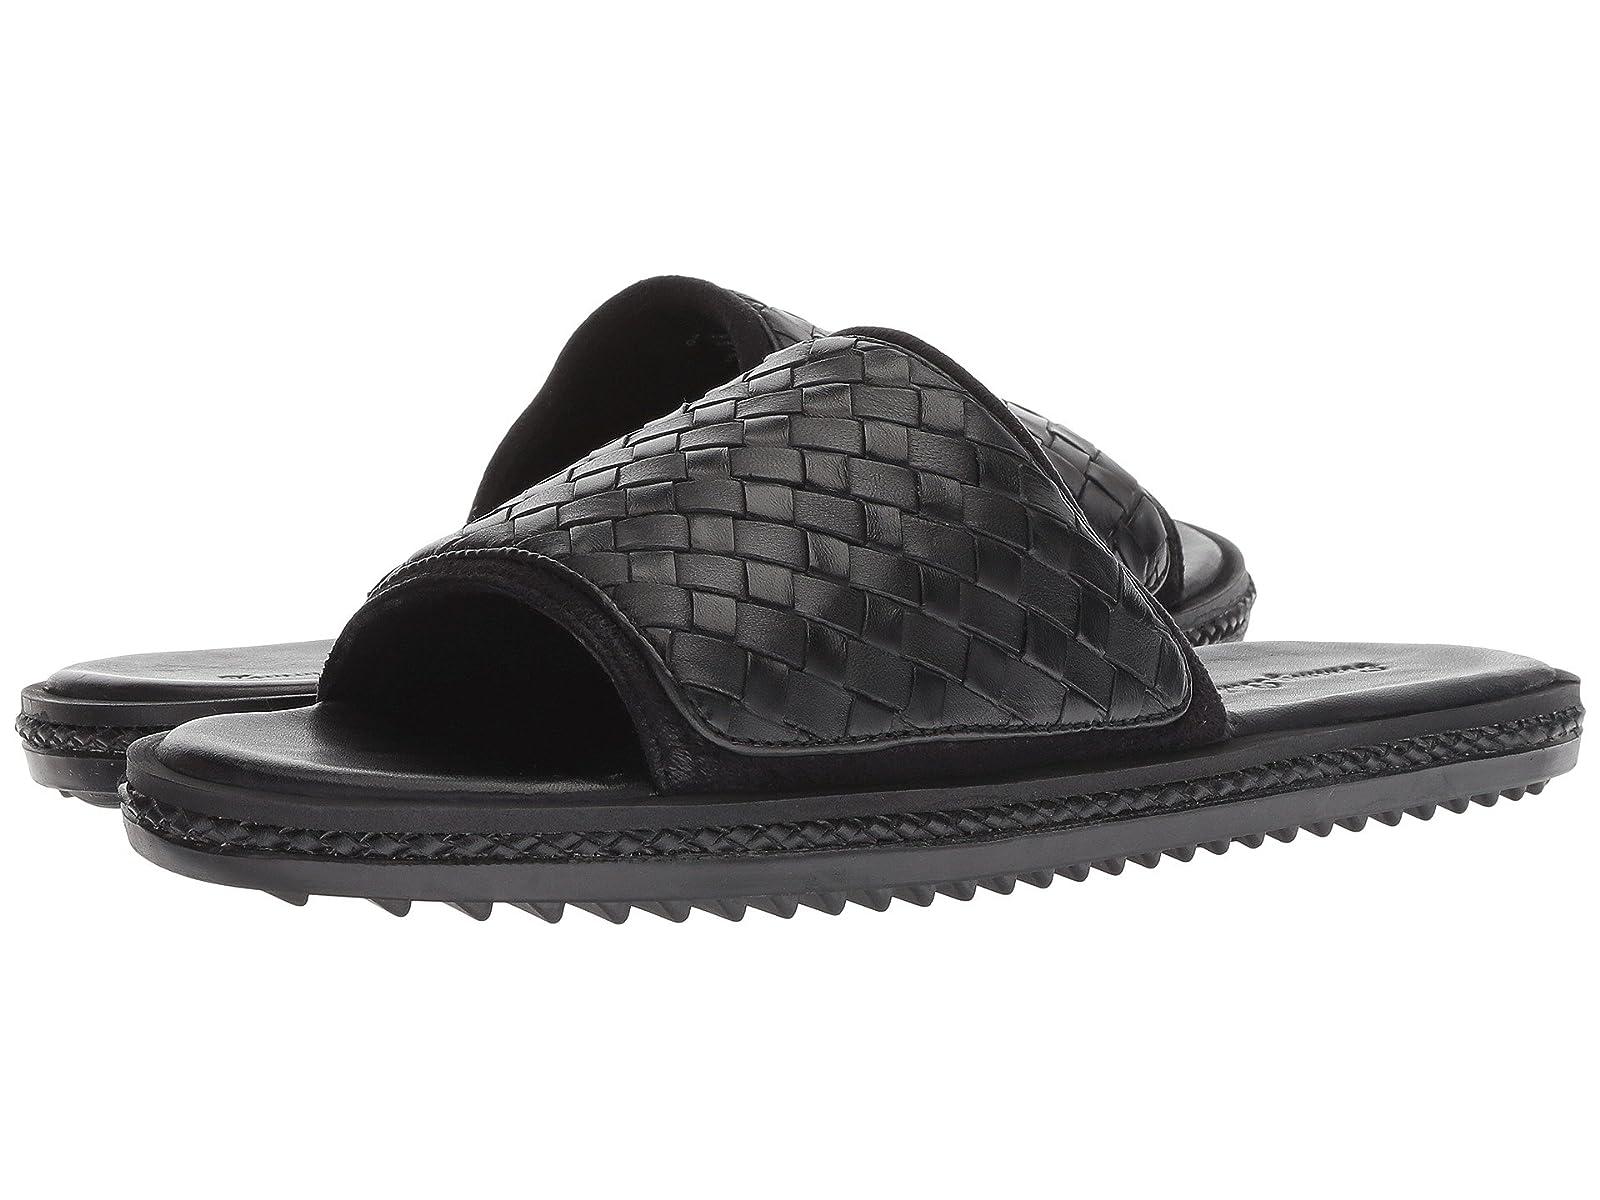 Tommy Bahama Land Crest SlideCheap and distinctive eye-catching shoes